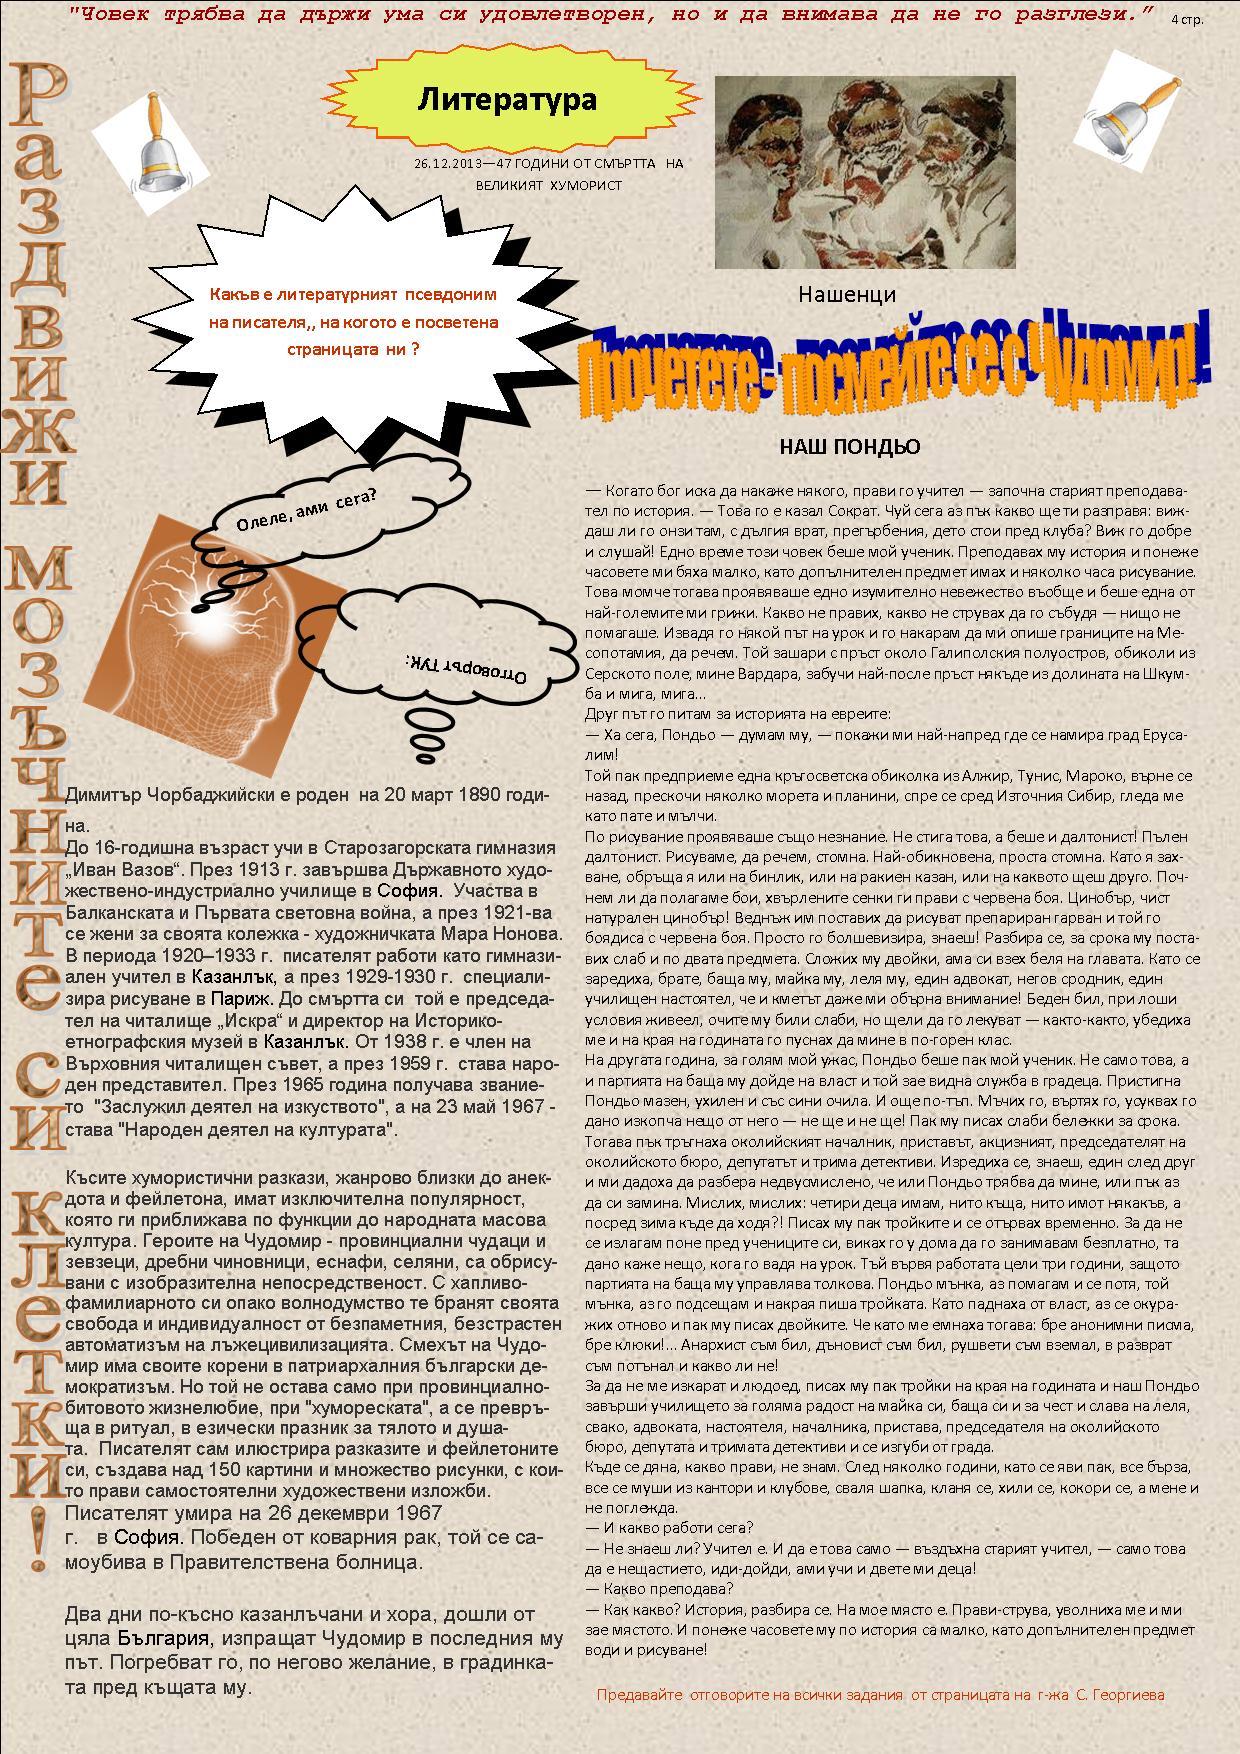 1вестник-12-ти бр-декември-стр-4 за 2013